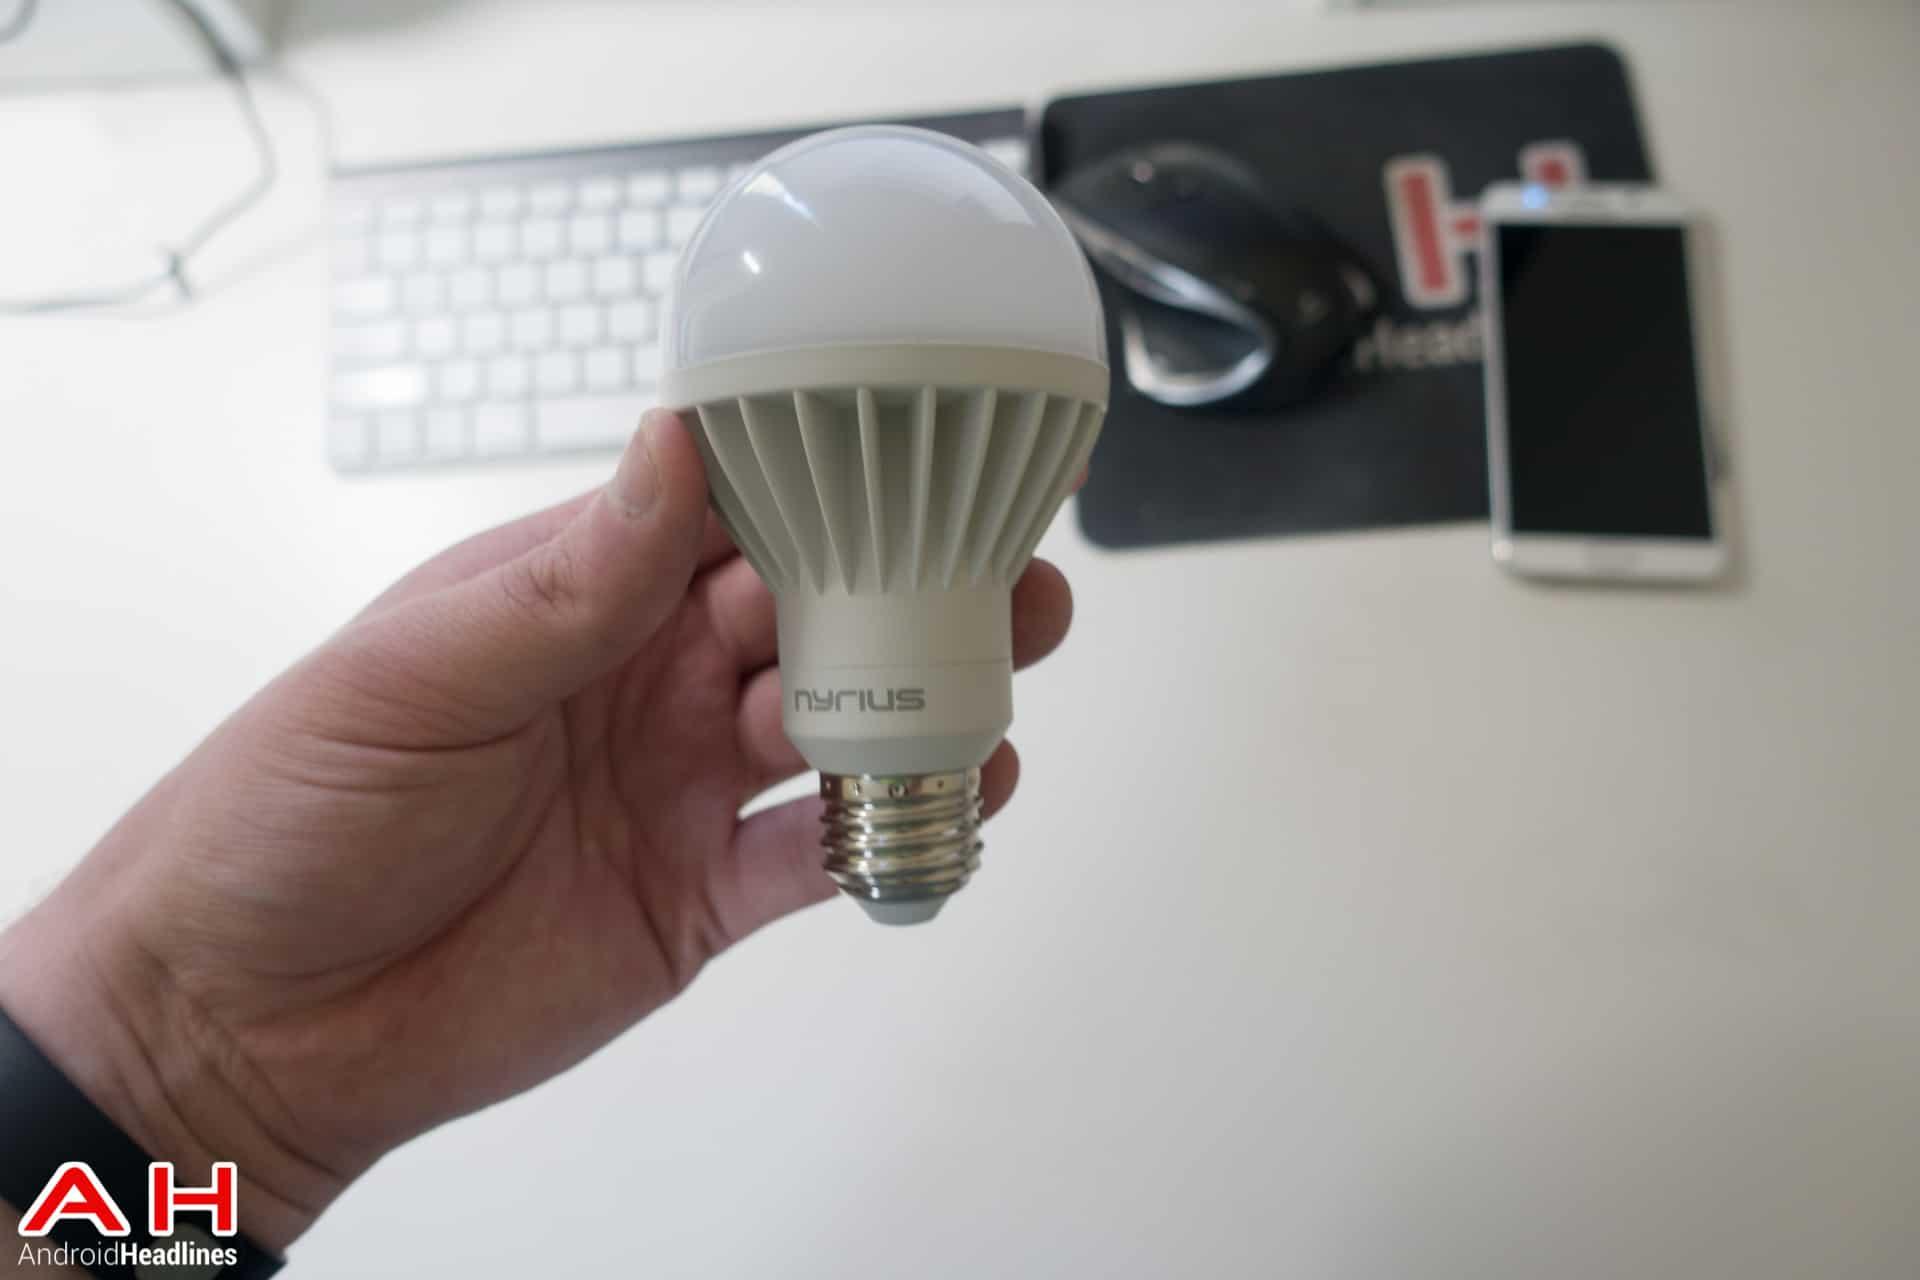 Nyrius Smart LED Bulb AH 7